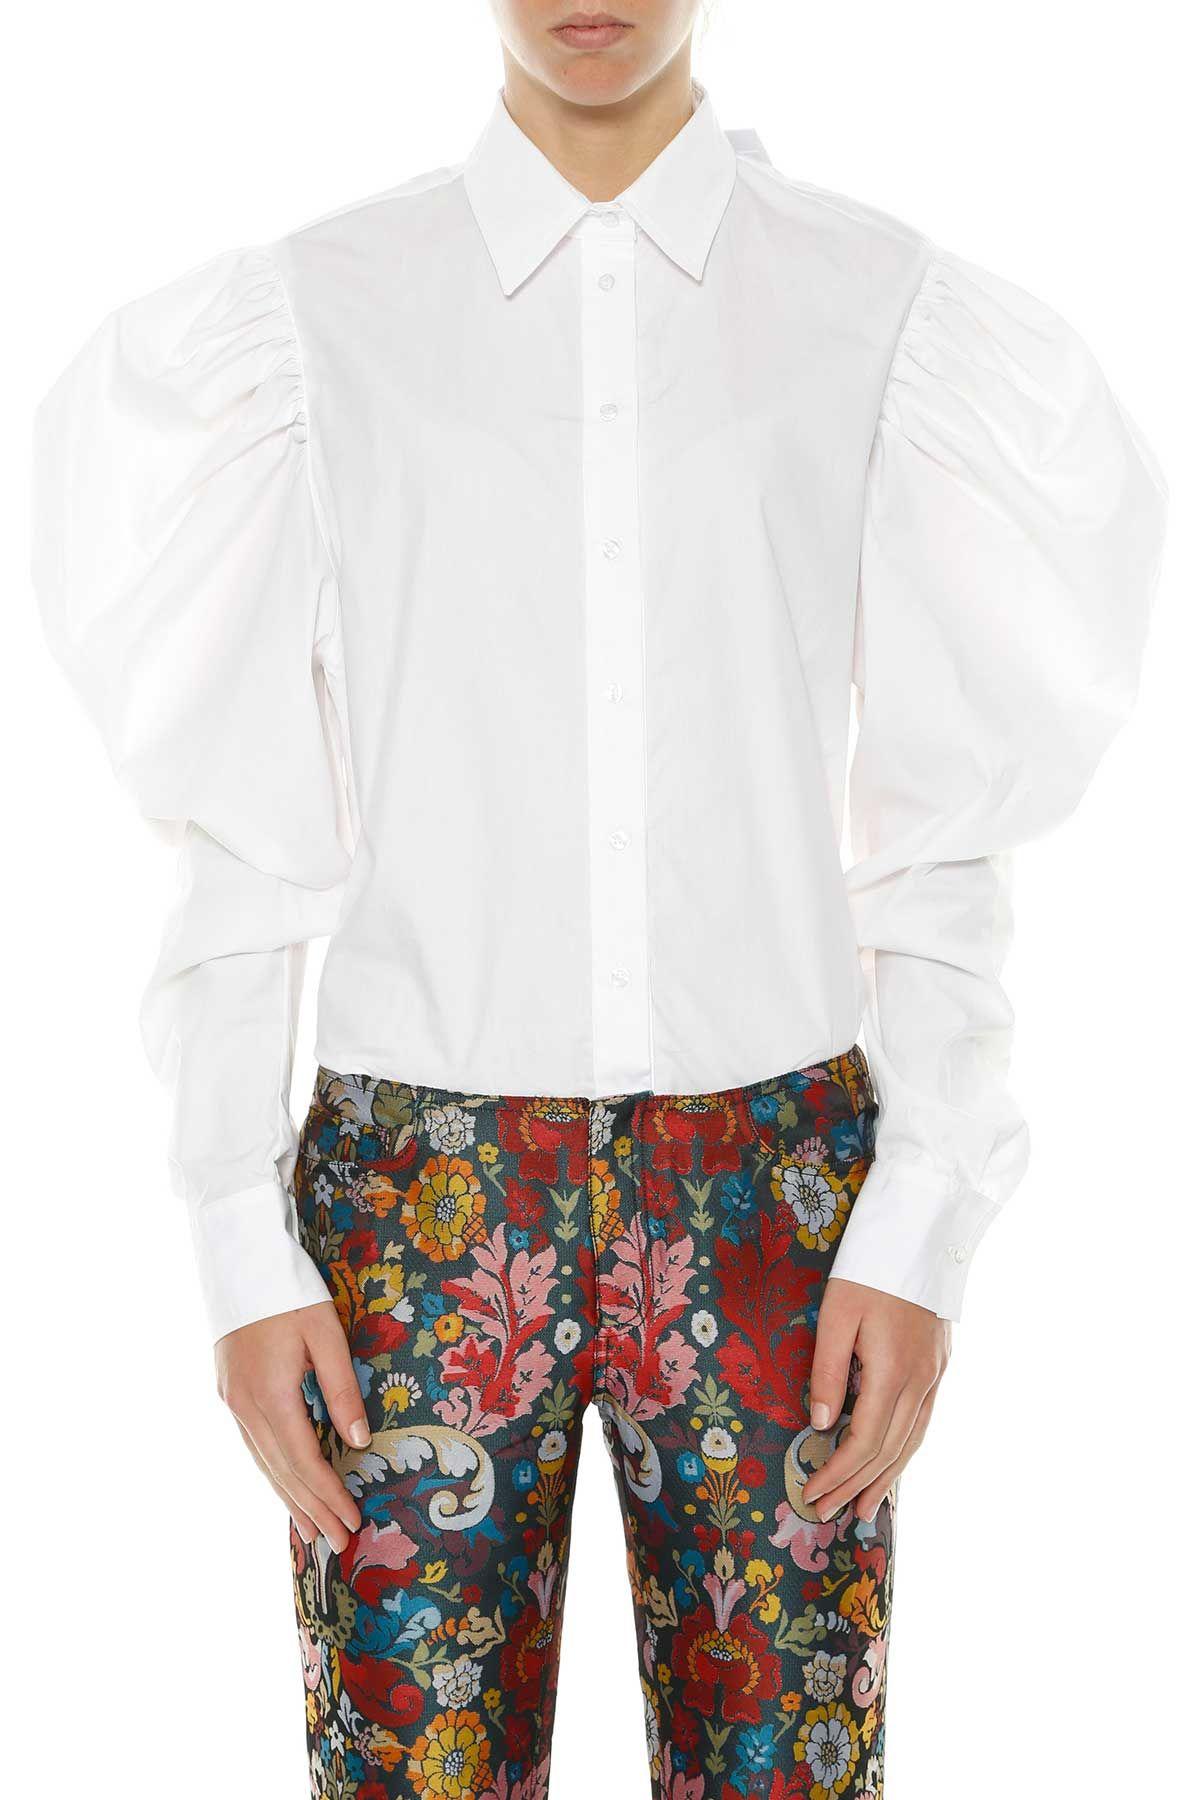 Marques Almeida Shirt With Wide Shoulder